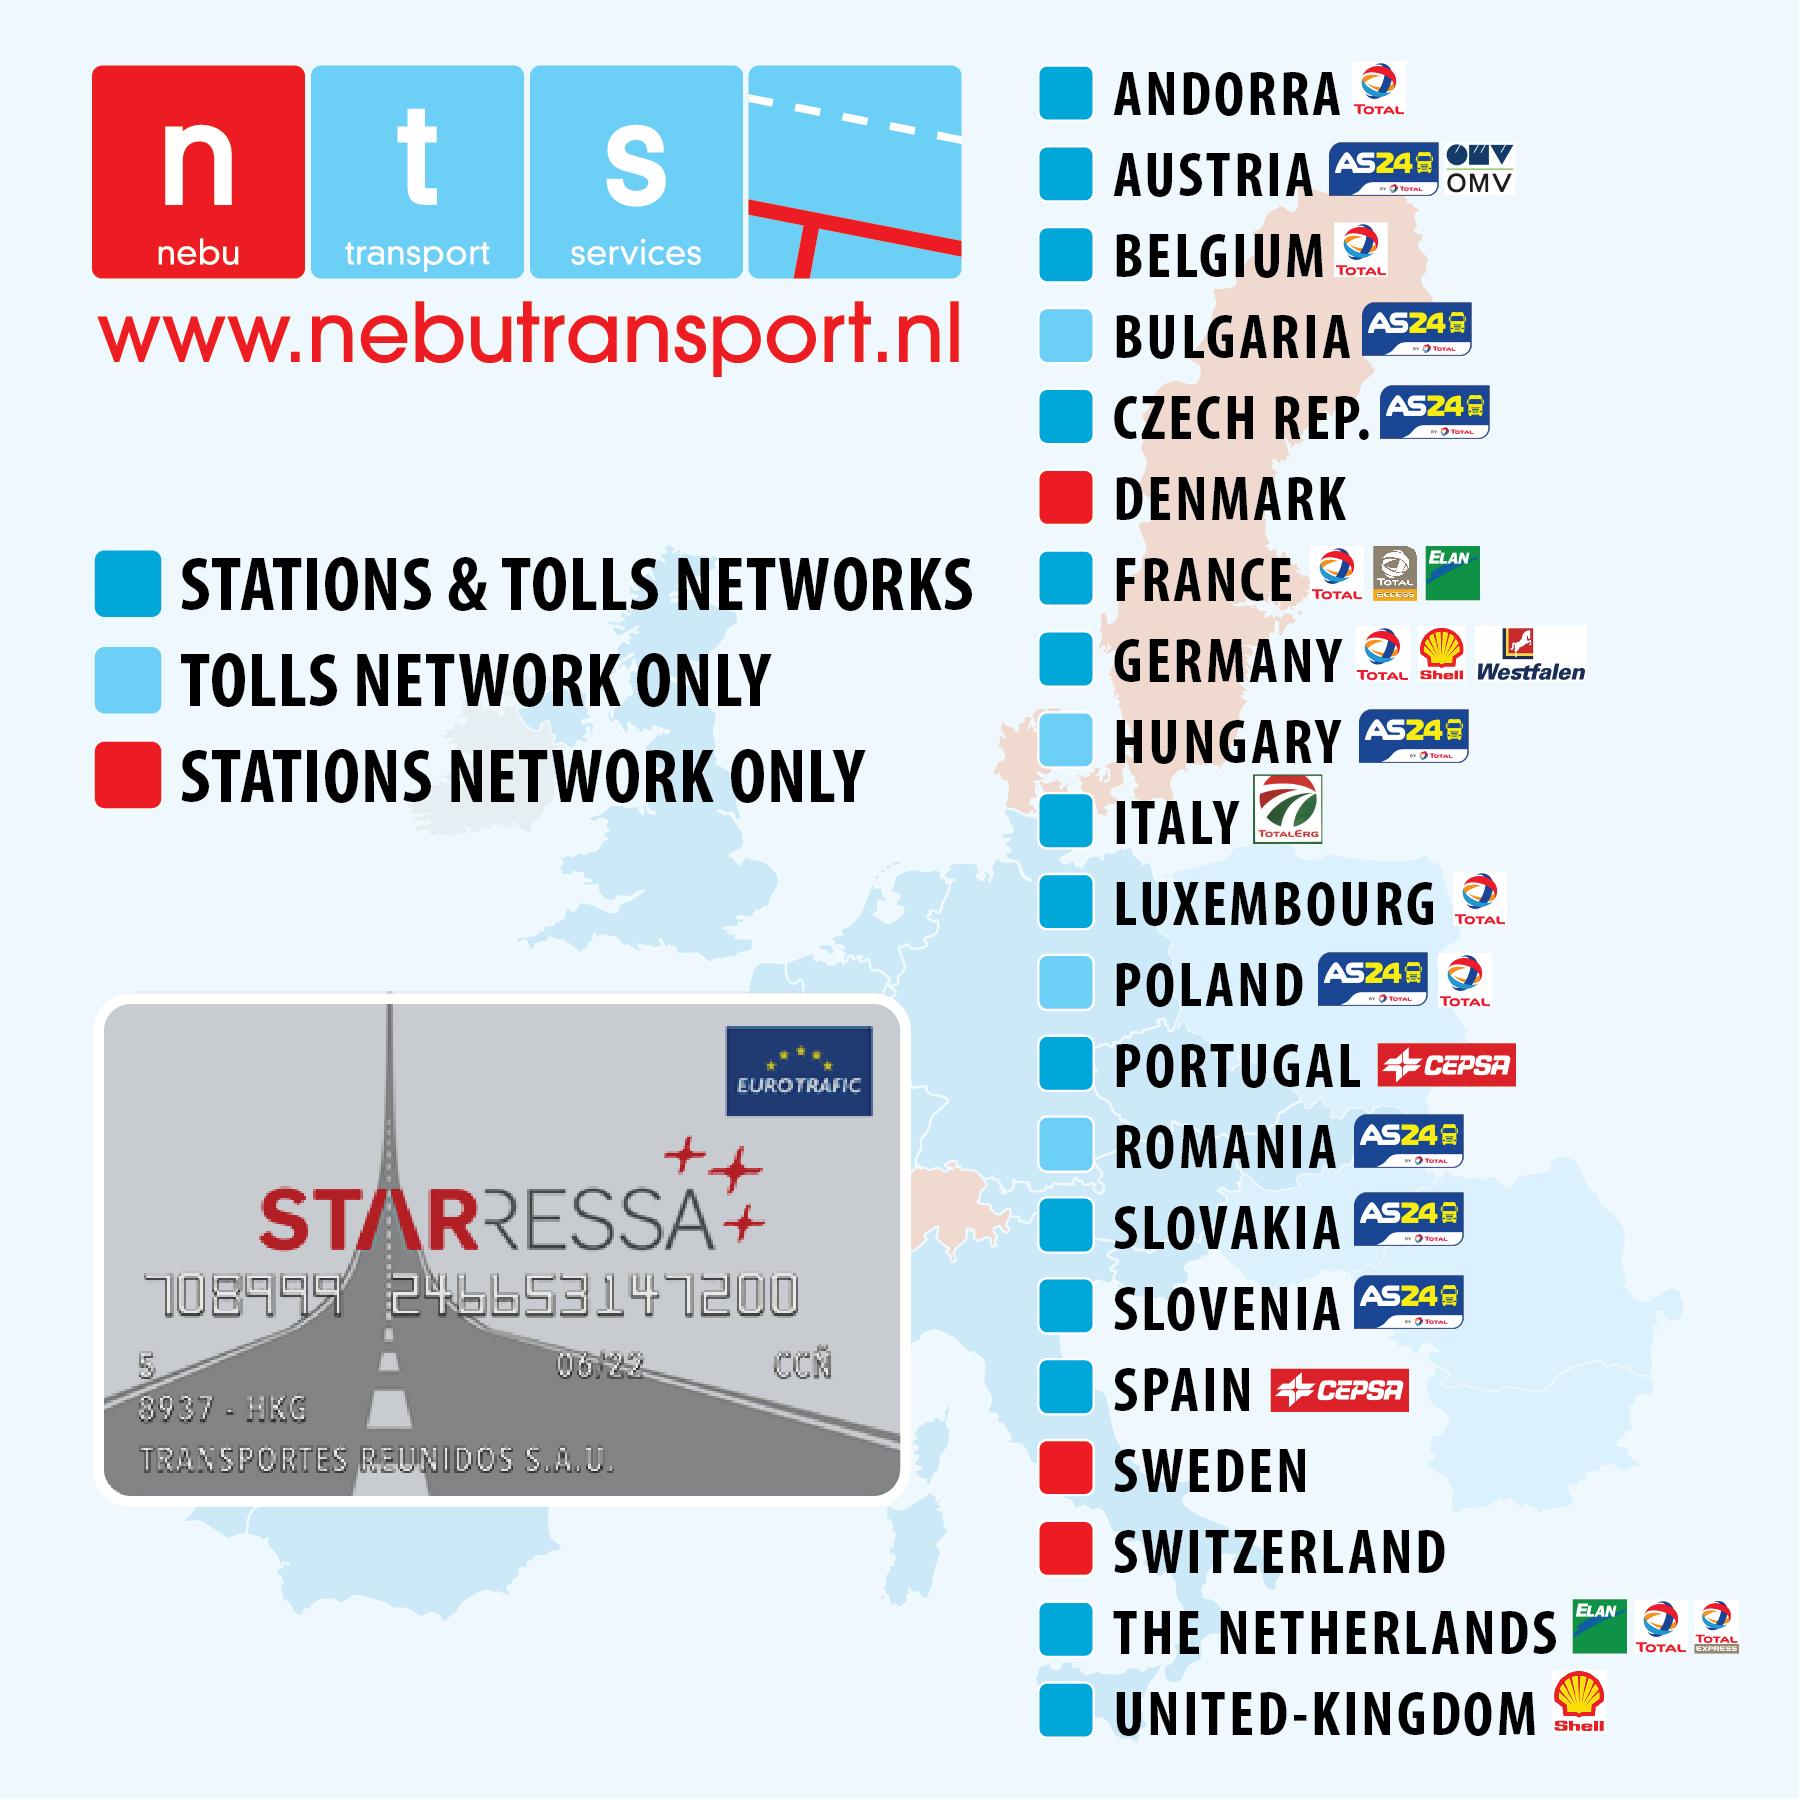 nebu-eurotrafic-card-graphic-aug2019-summary.jpg